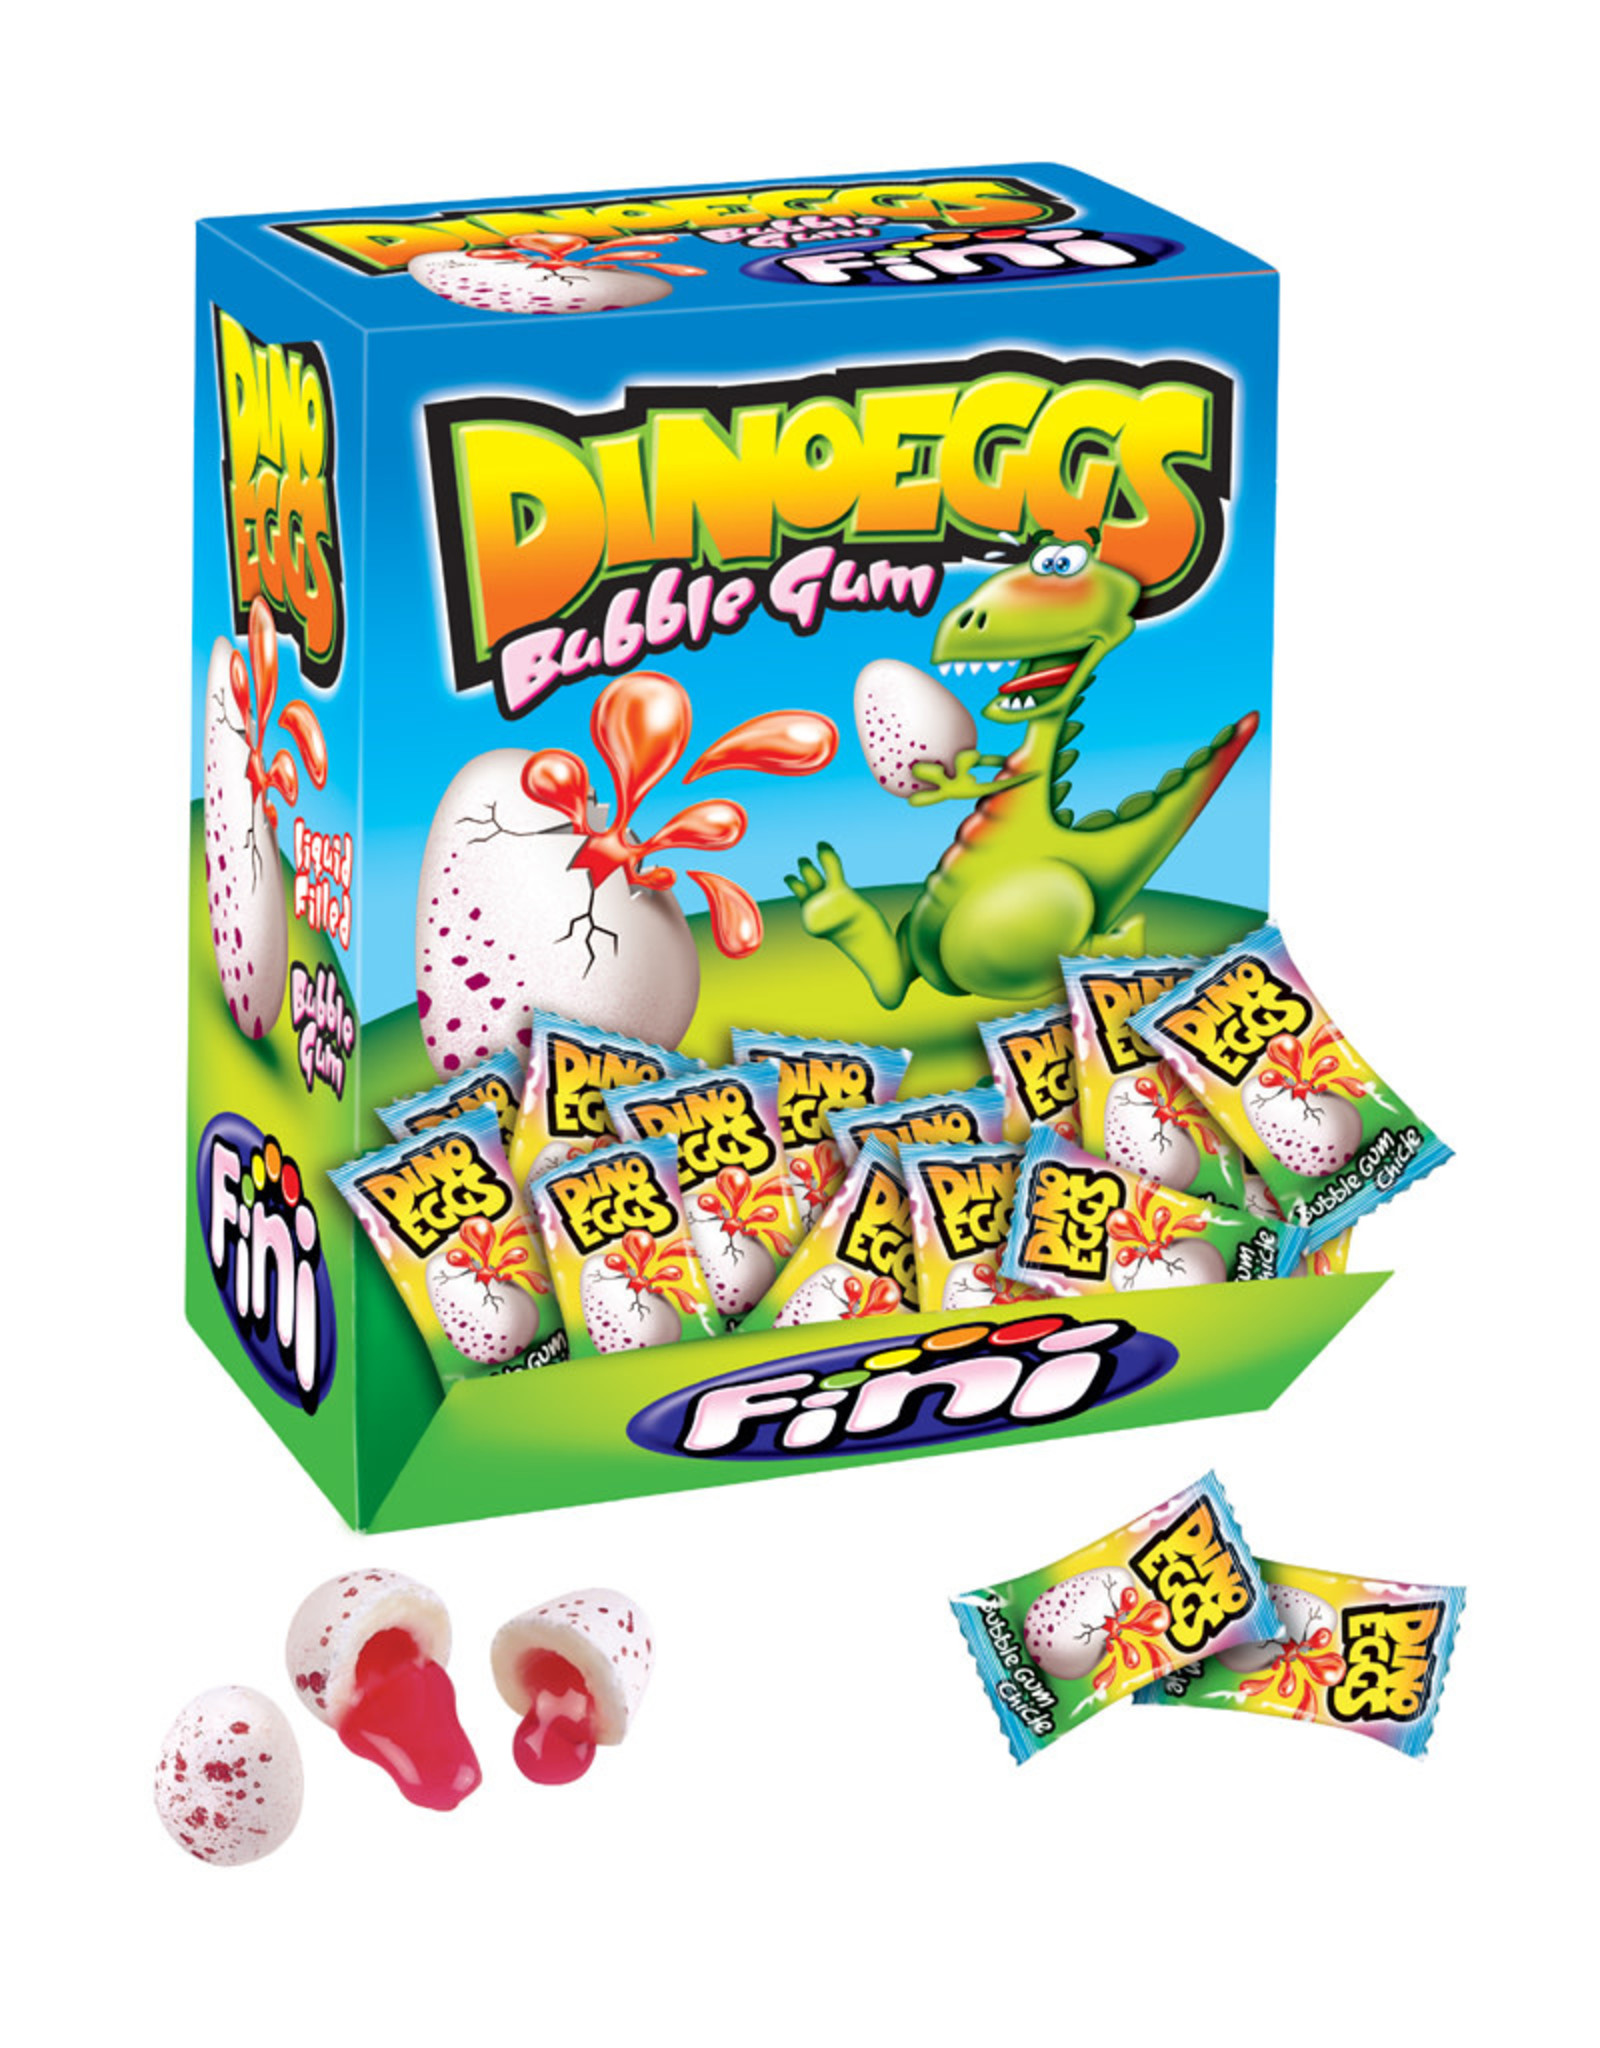 Dino Eggs ( 8 Bubble Gum ) Juicy